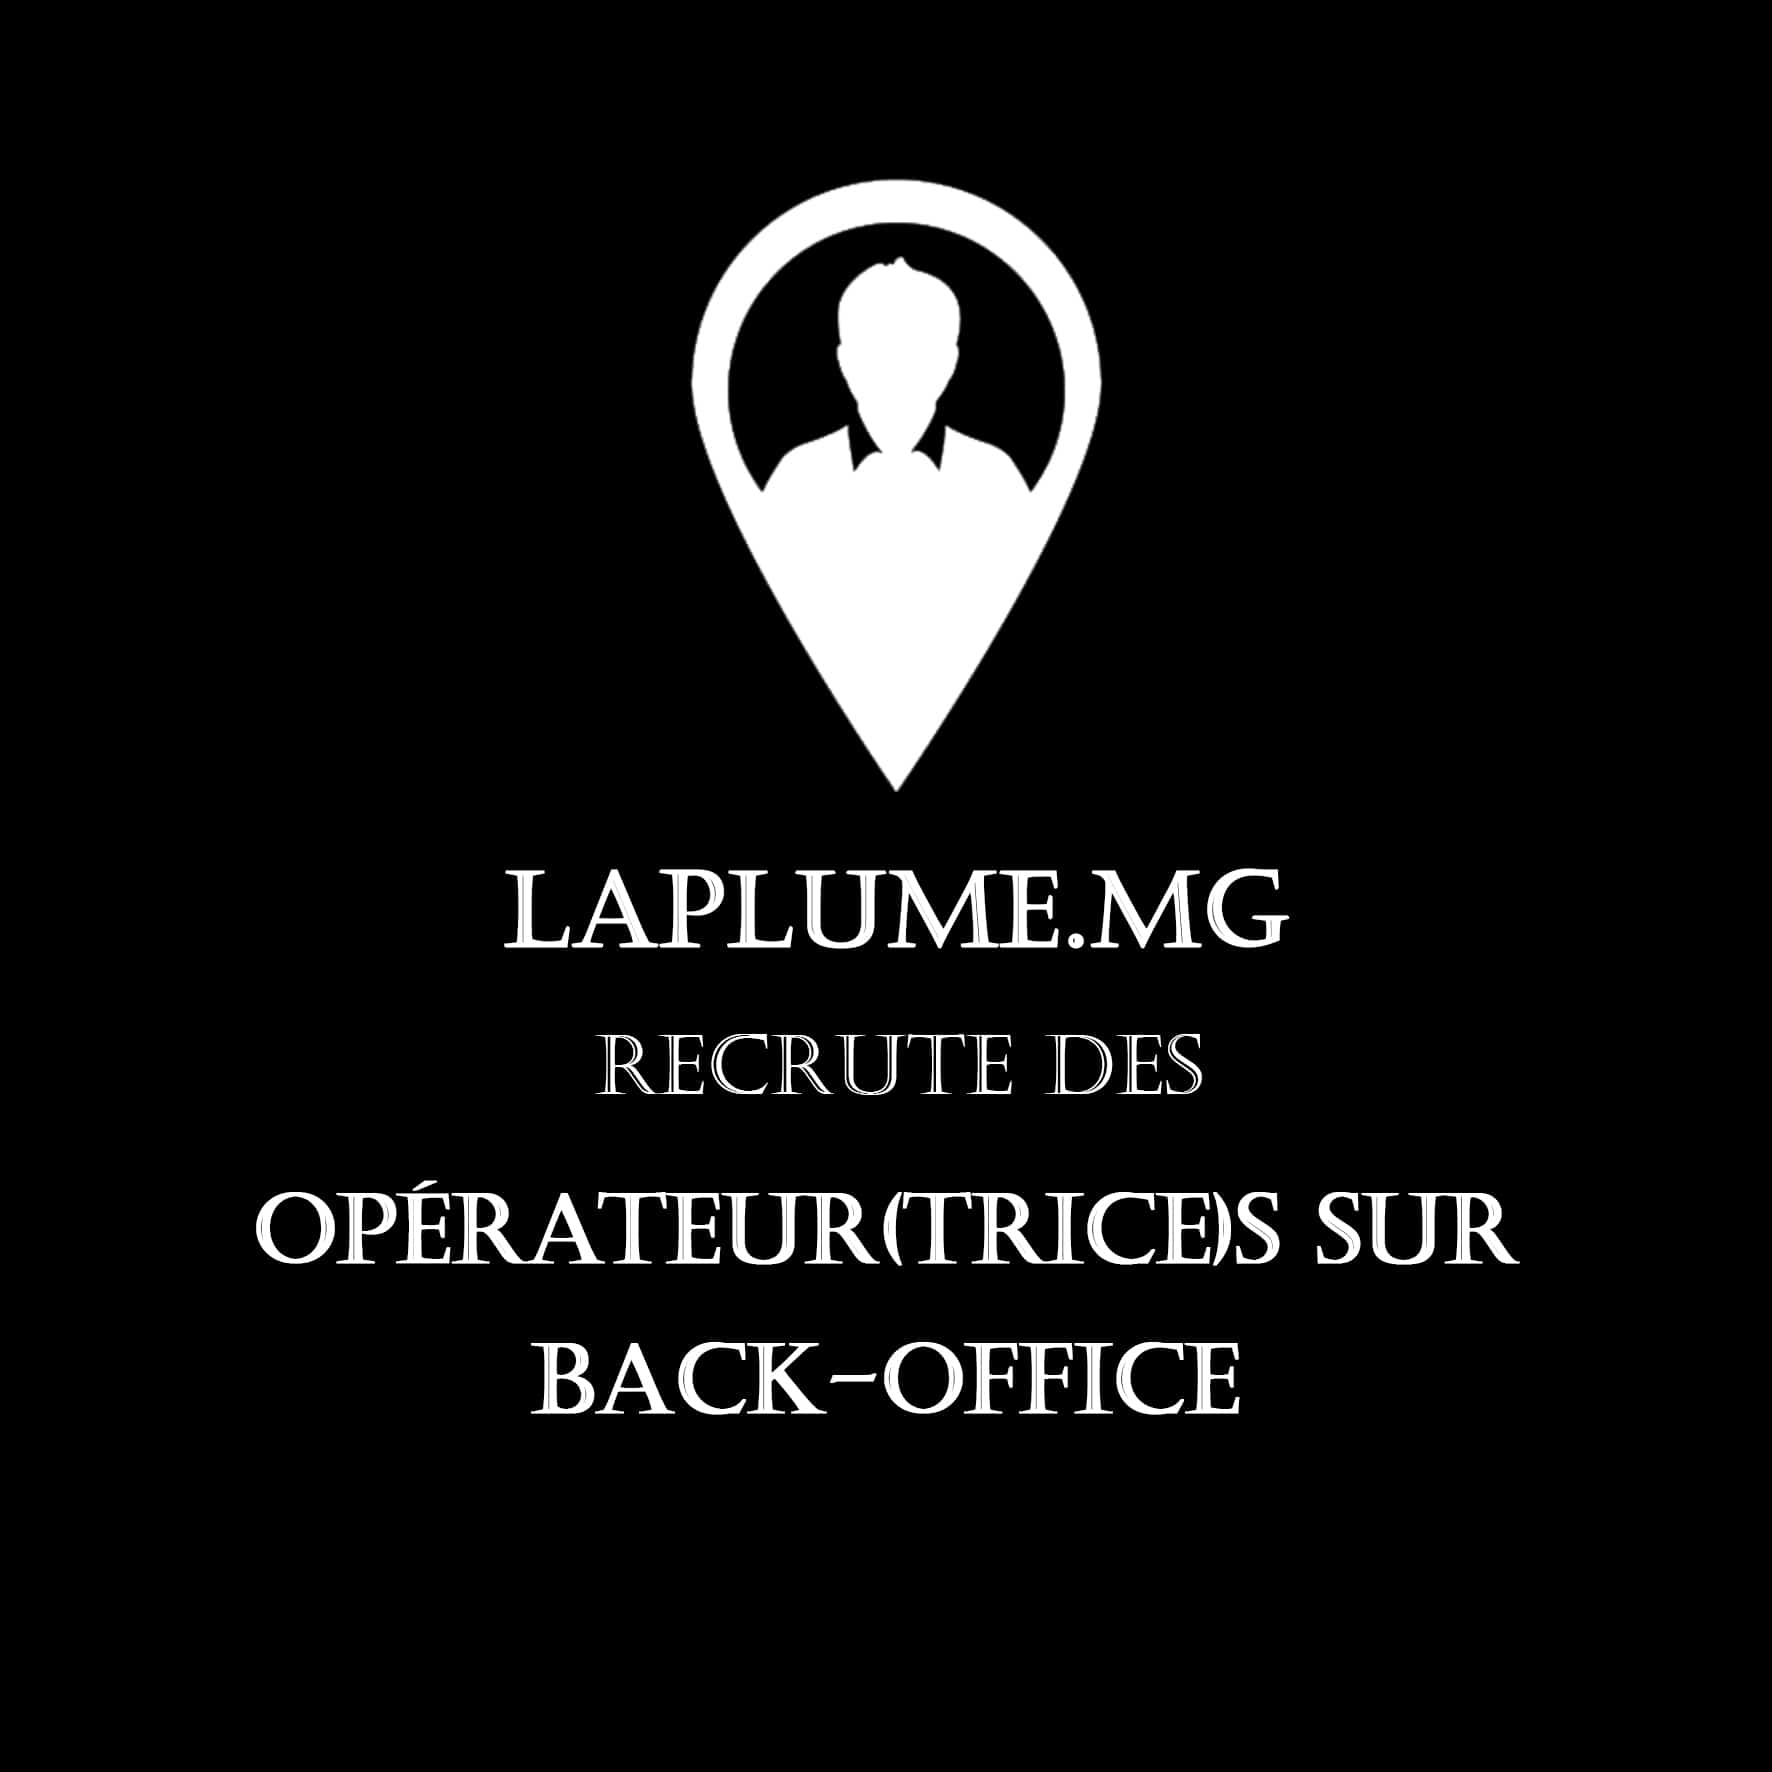 RECRUTEMENT : OPERATEURS SUR BACK-OFFICE